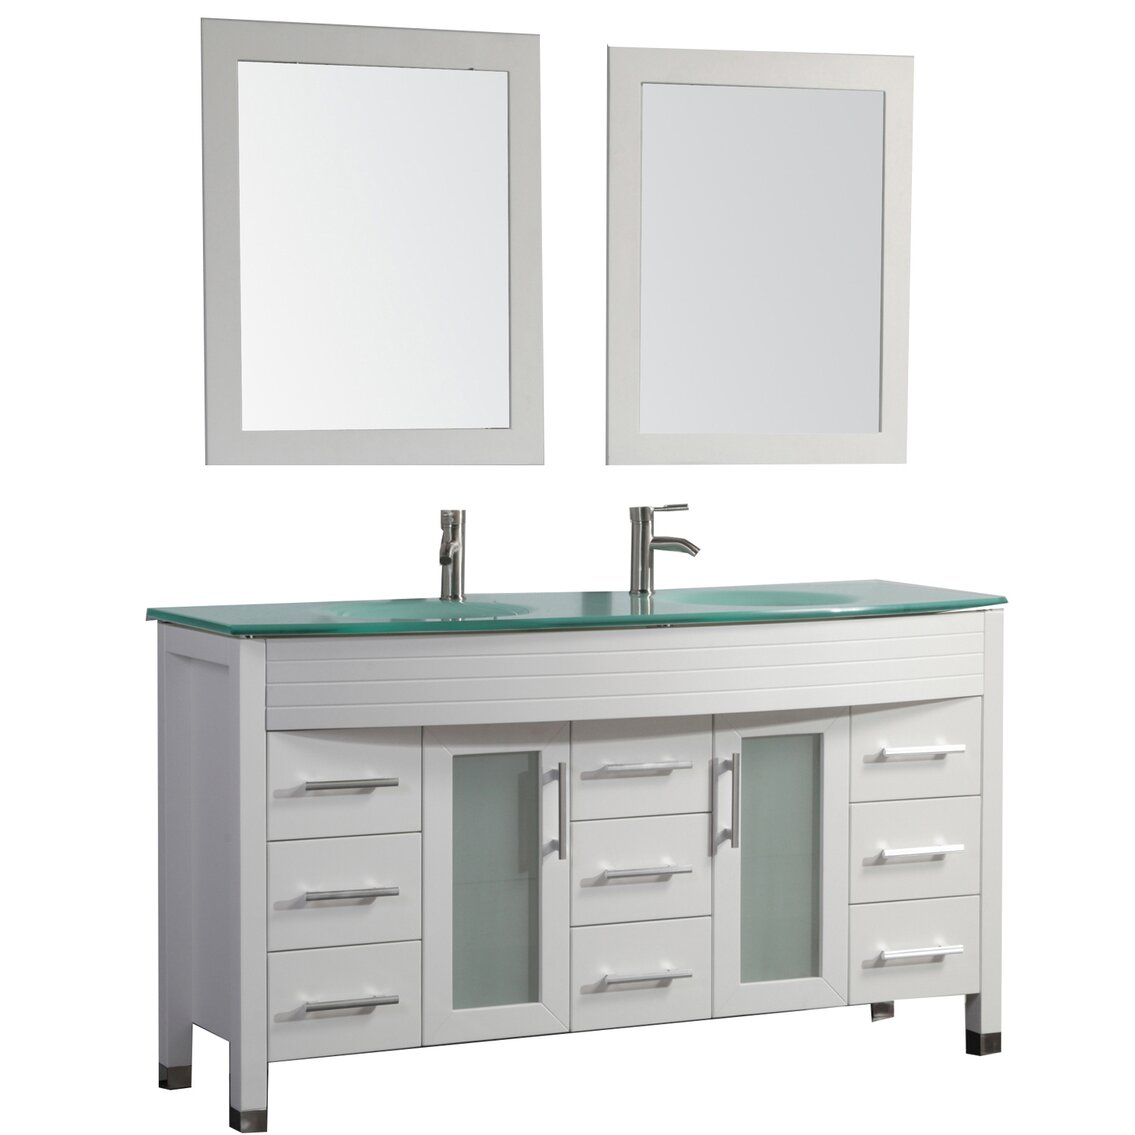 Mtdvanities Figi 63 Double Sink Bathroom Vanity Set With Mirrors Reviews Wayfair